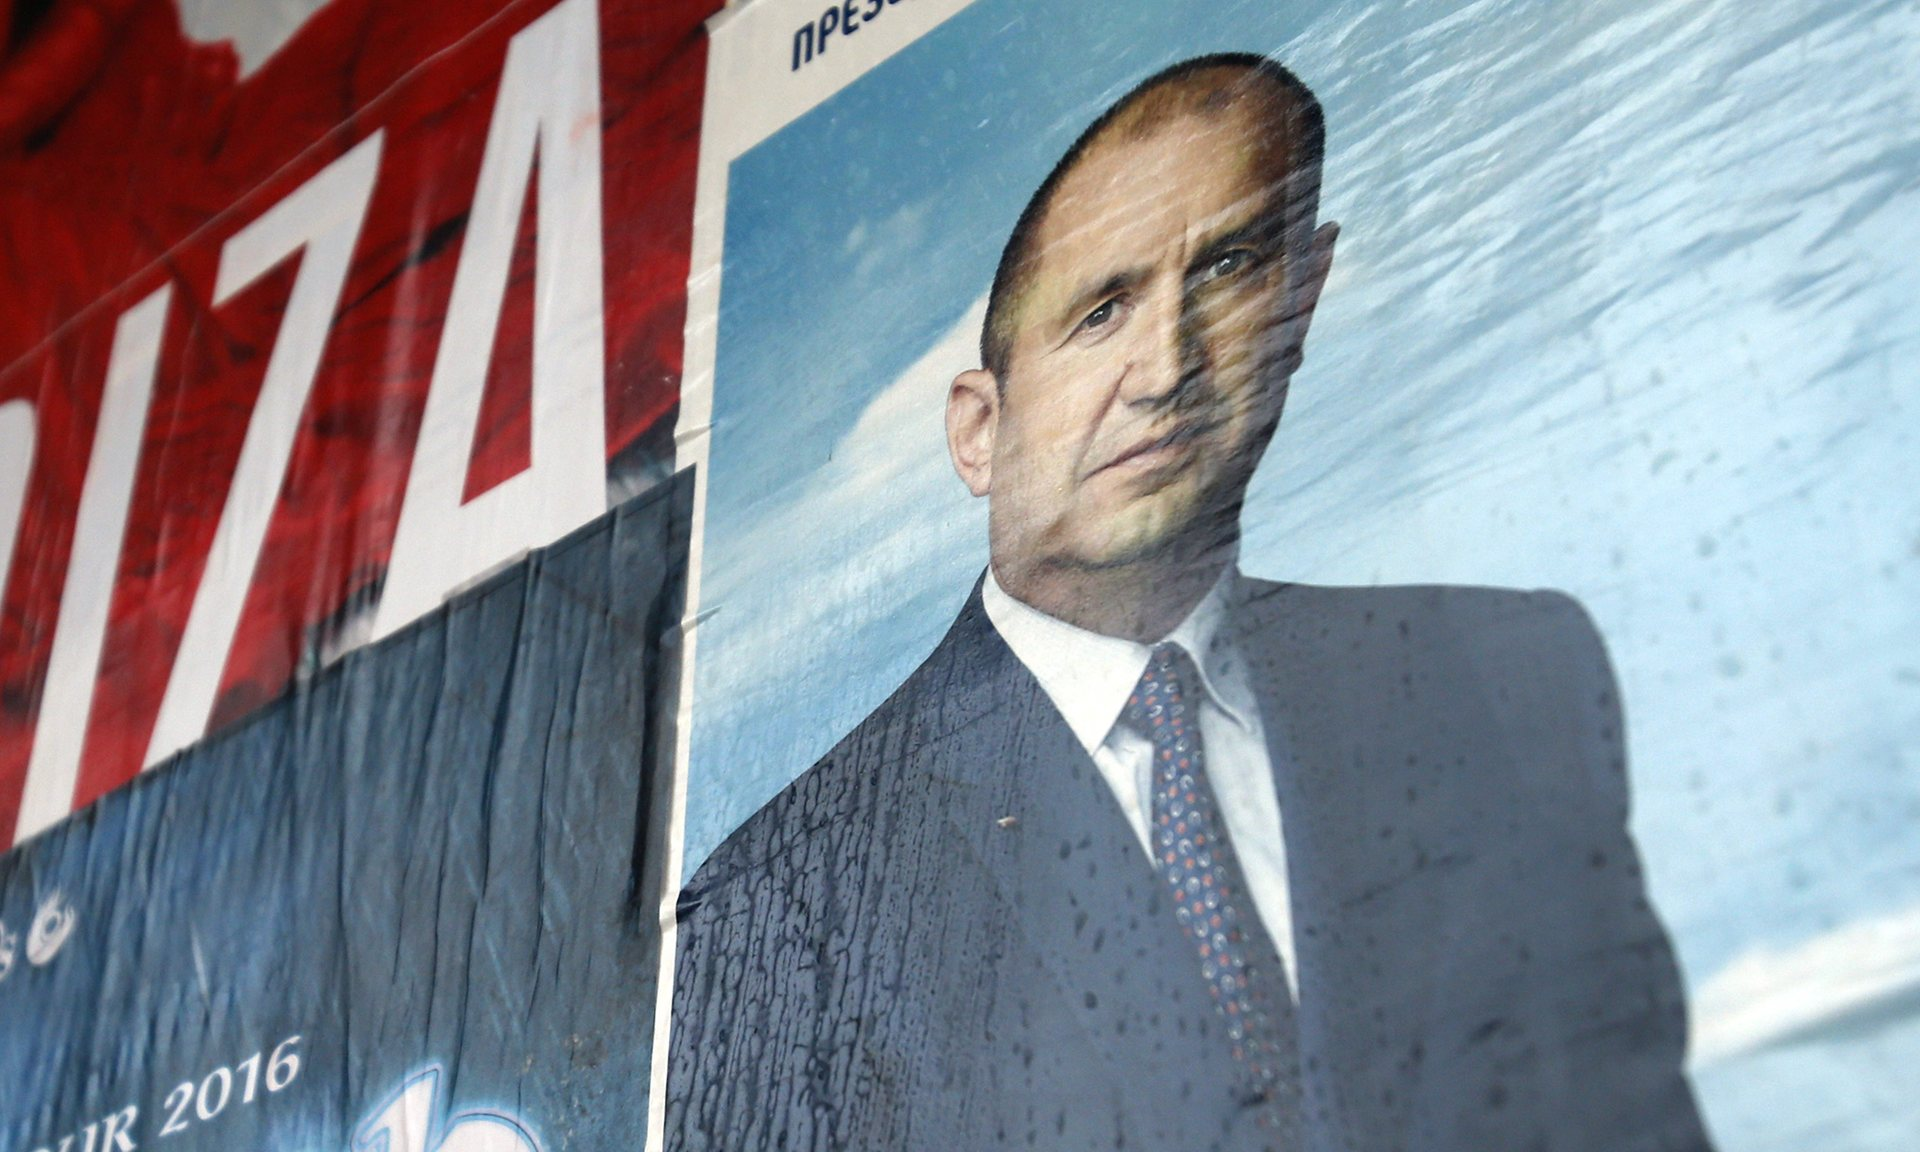 'Pro-Russia' Presidential Candidates Win in Bulgaria and Moldova